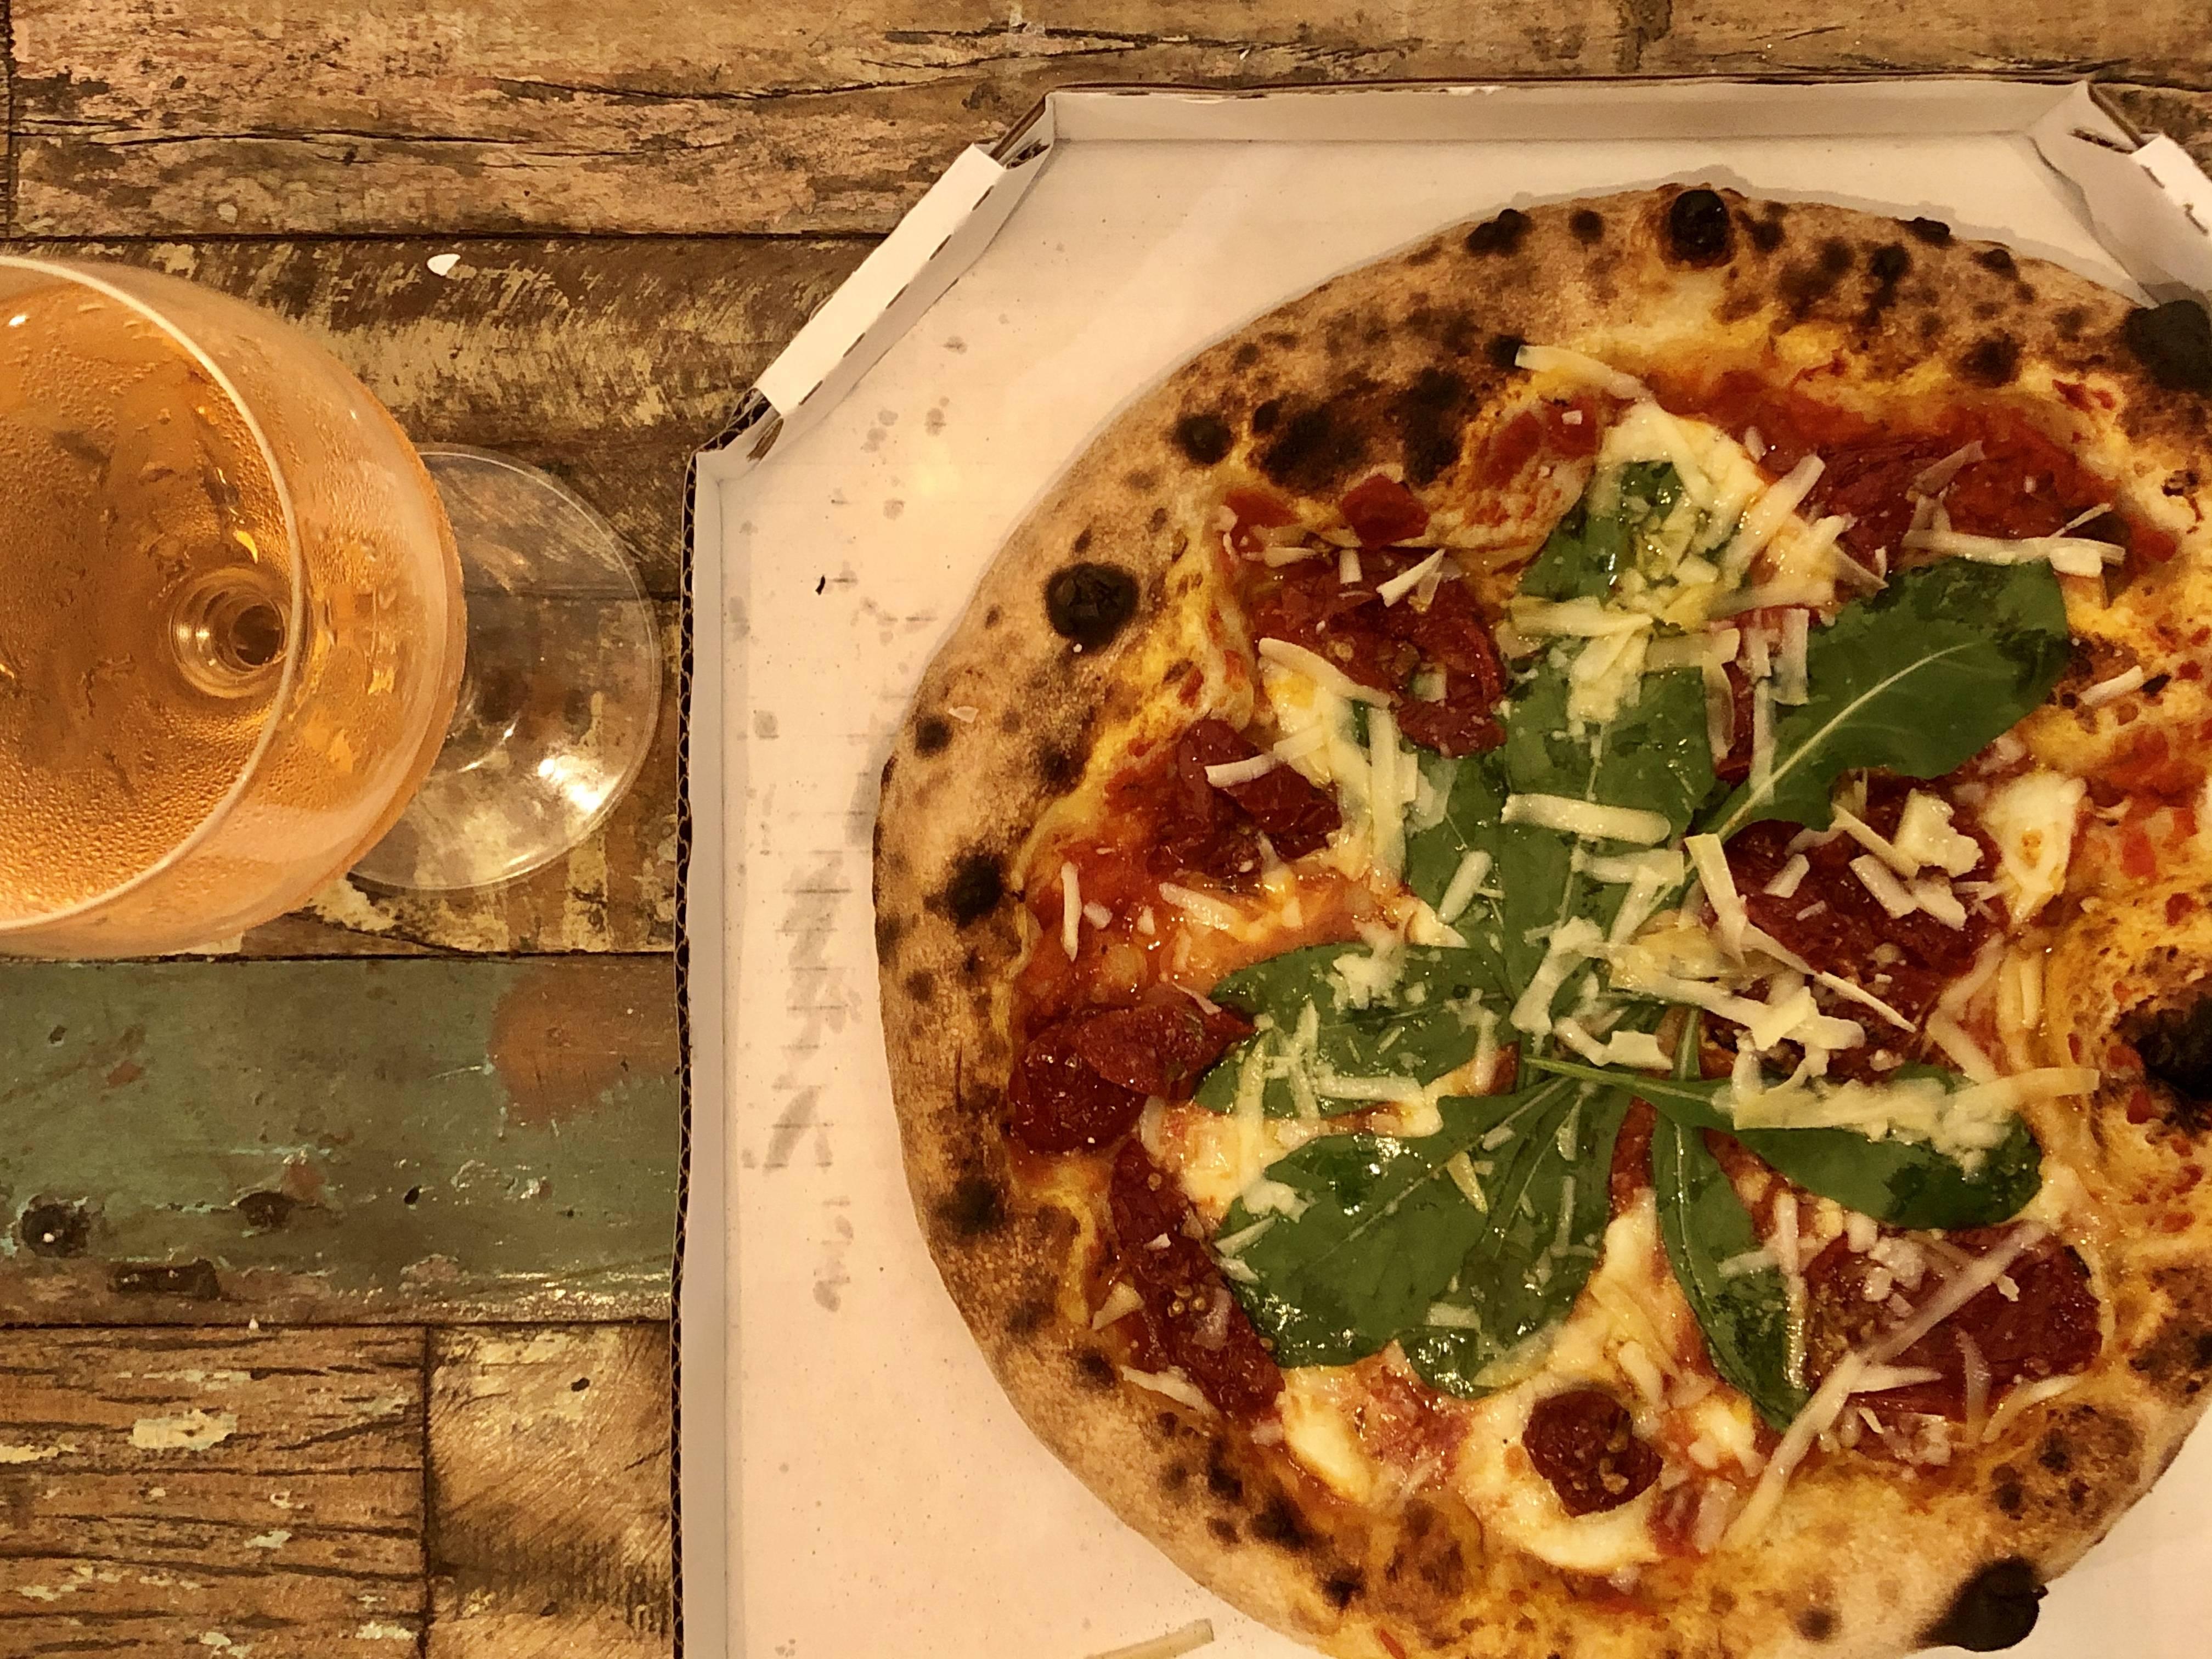 www.juicysantos.com.br - paolo pizza pizza neonapoletana em santos sp